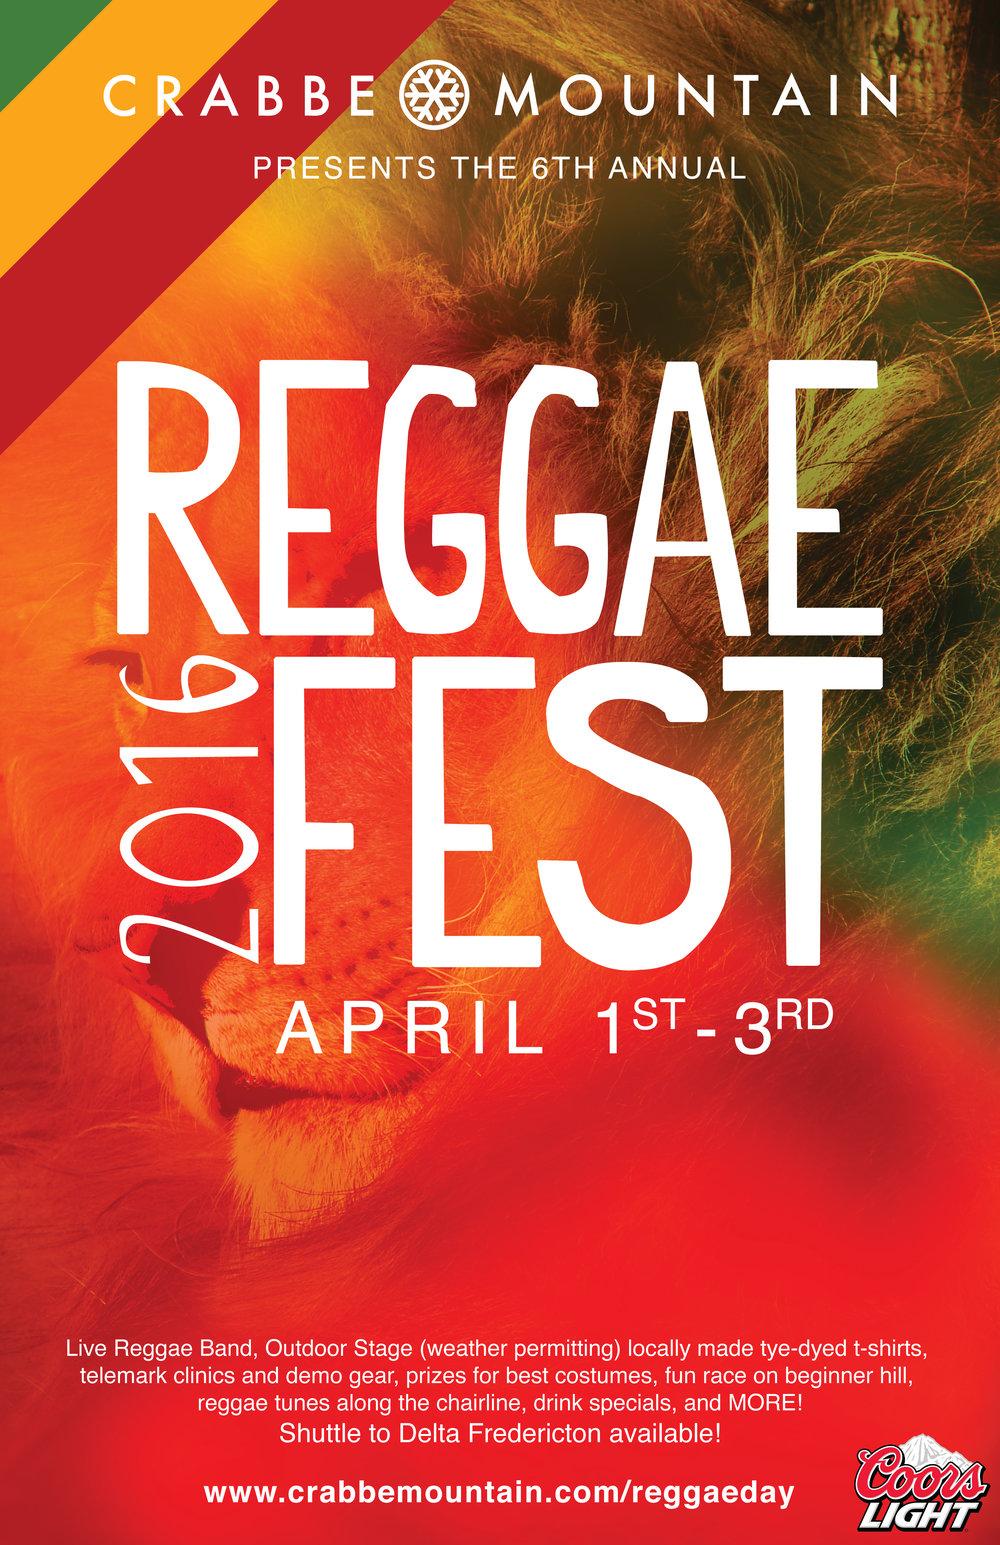 ReggaeFestPoster-02.jpg